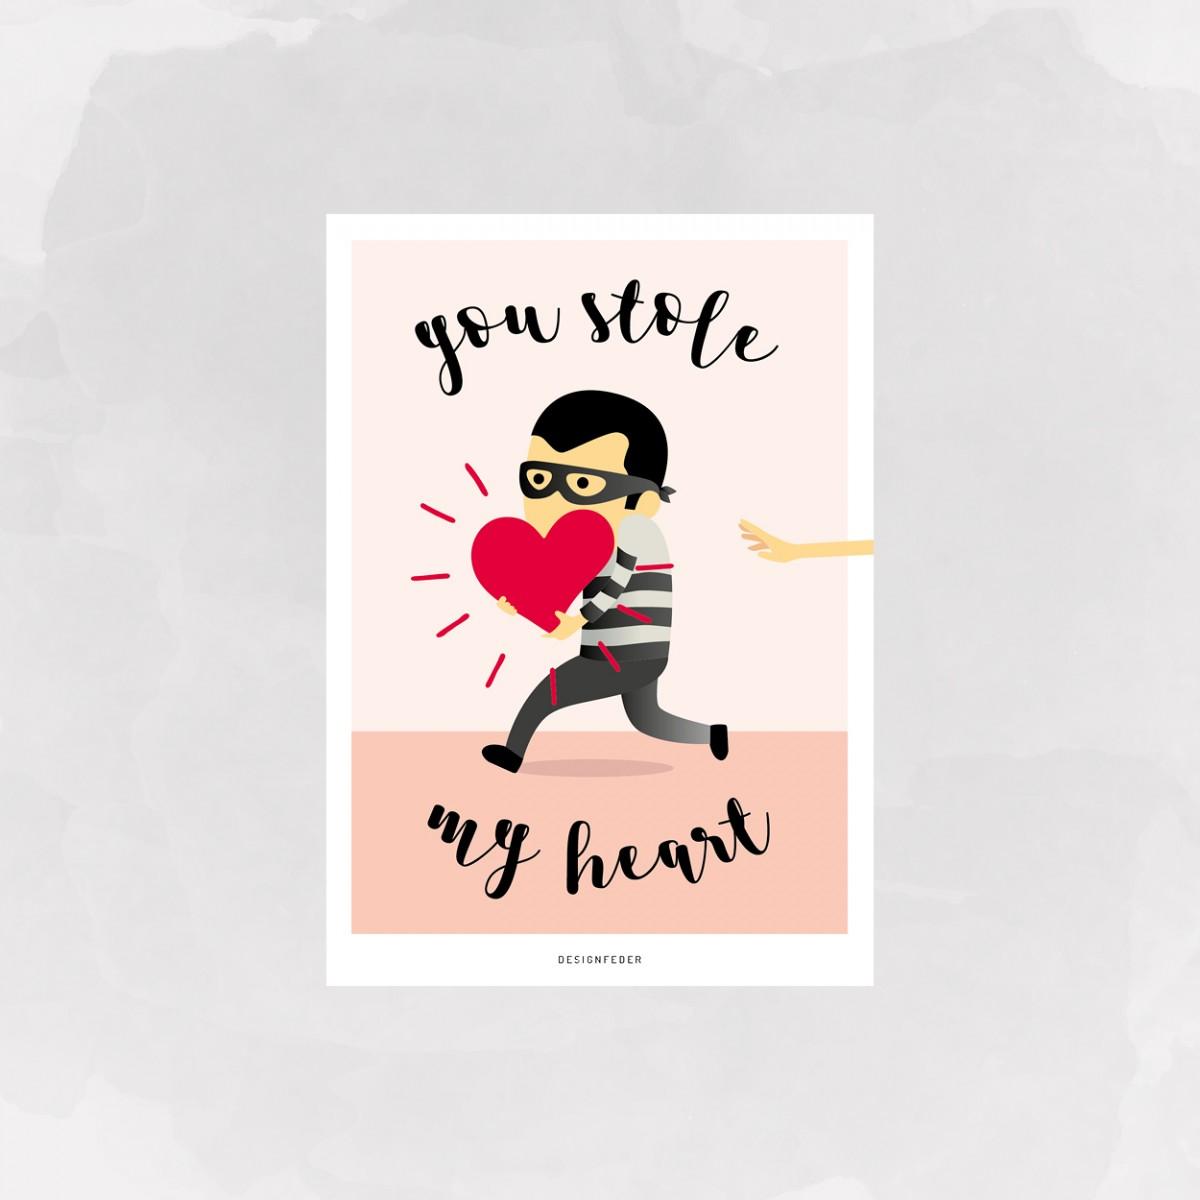 designfeder | Postkarte Stole my Heart